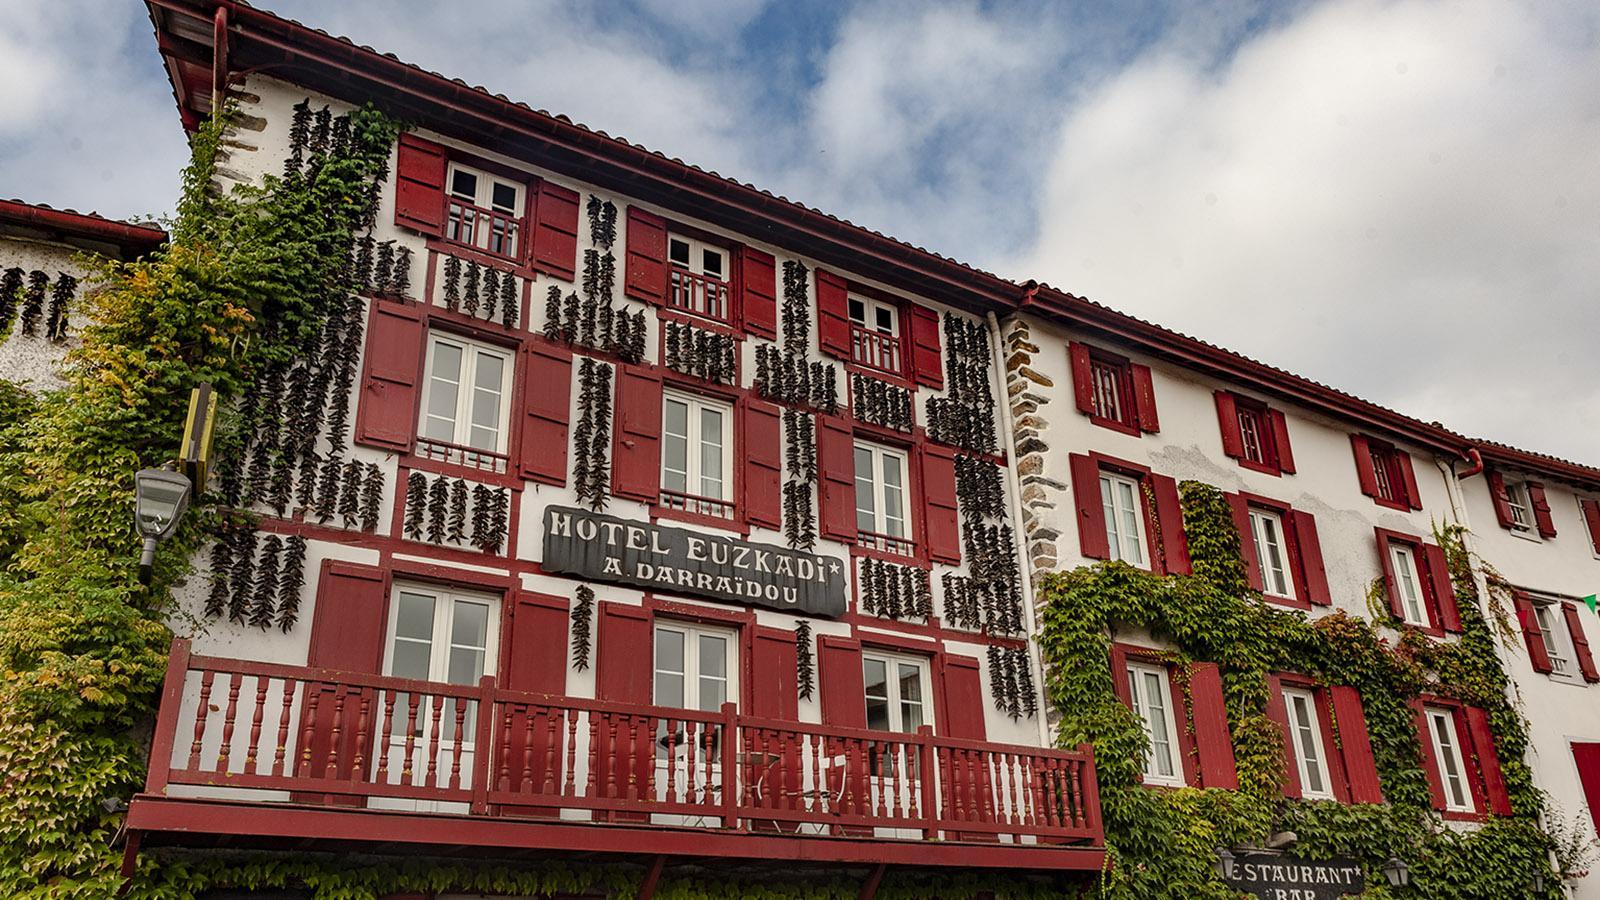 Auch das Hôtel Euzkadi ist mit Piment d'Espelette geschmückt. Foto: Hilke Maunder